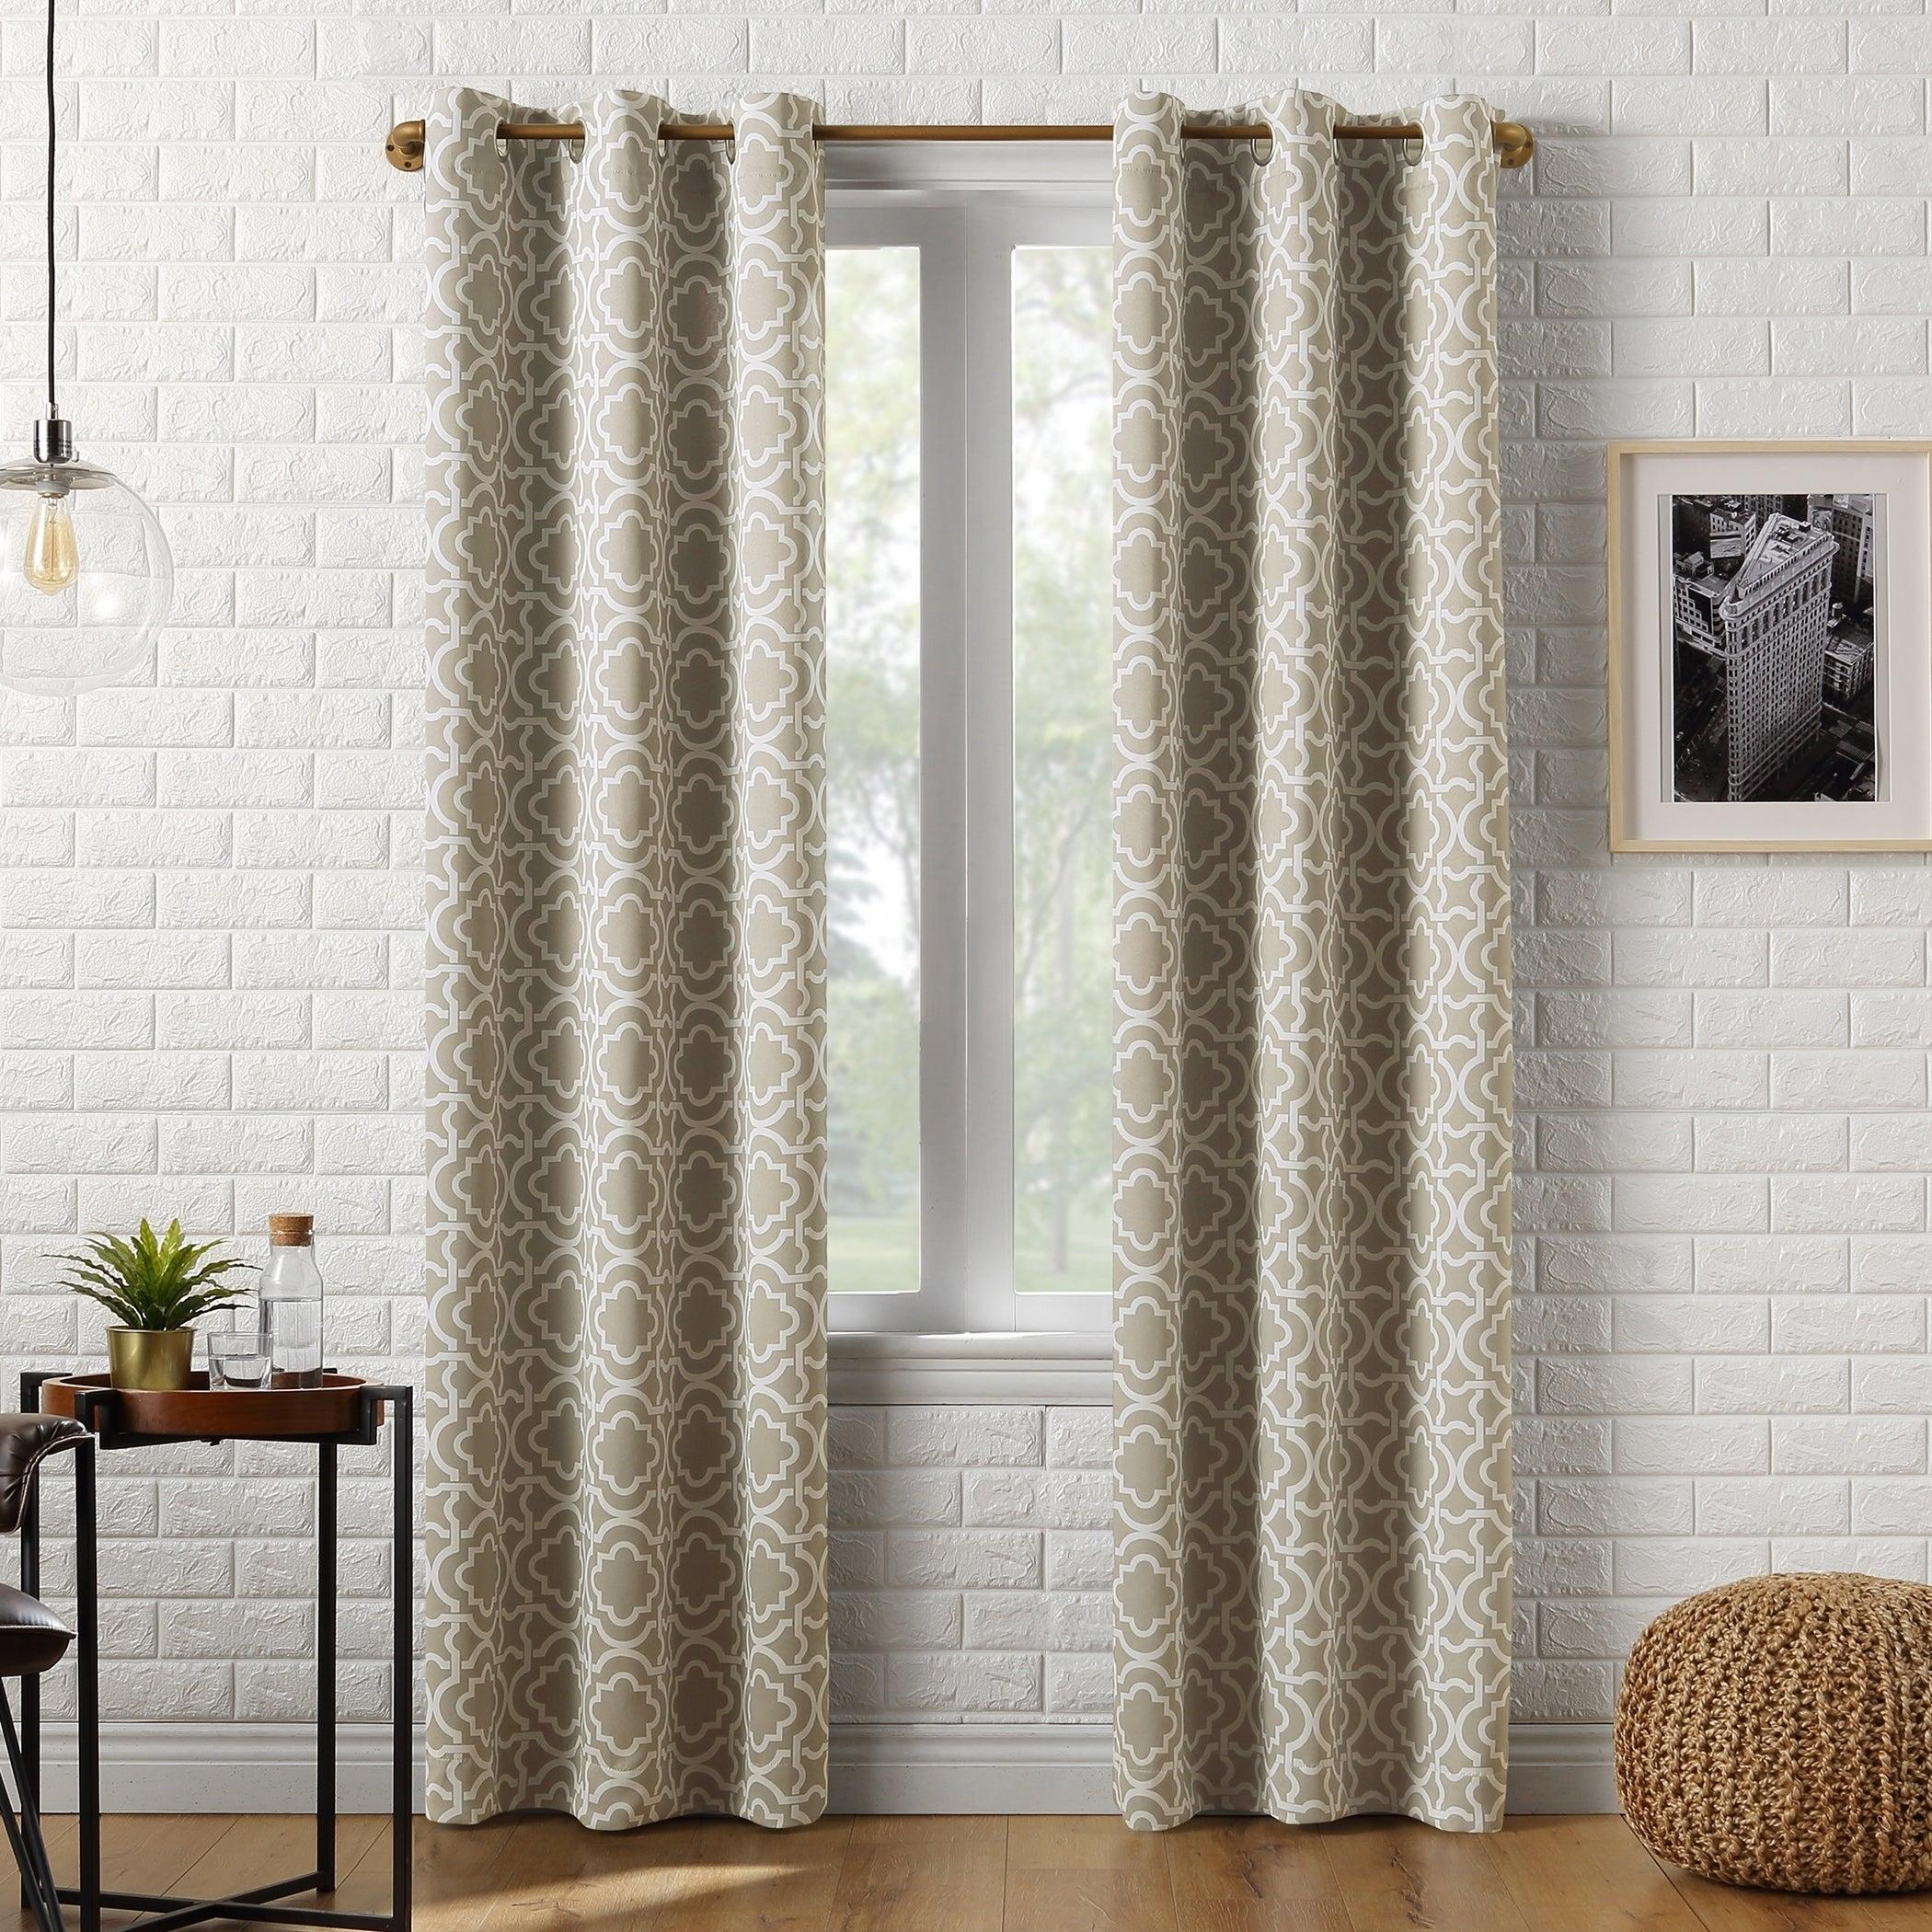 Details About Sun Zero Barnett Trellis Blackout Grommet Curtain Panel Within Riley Kids Bedroom Blackout Grommet Curtain Panels (View 18 of 20)